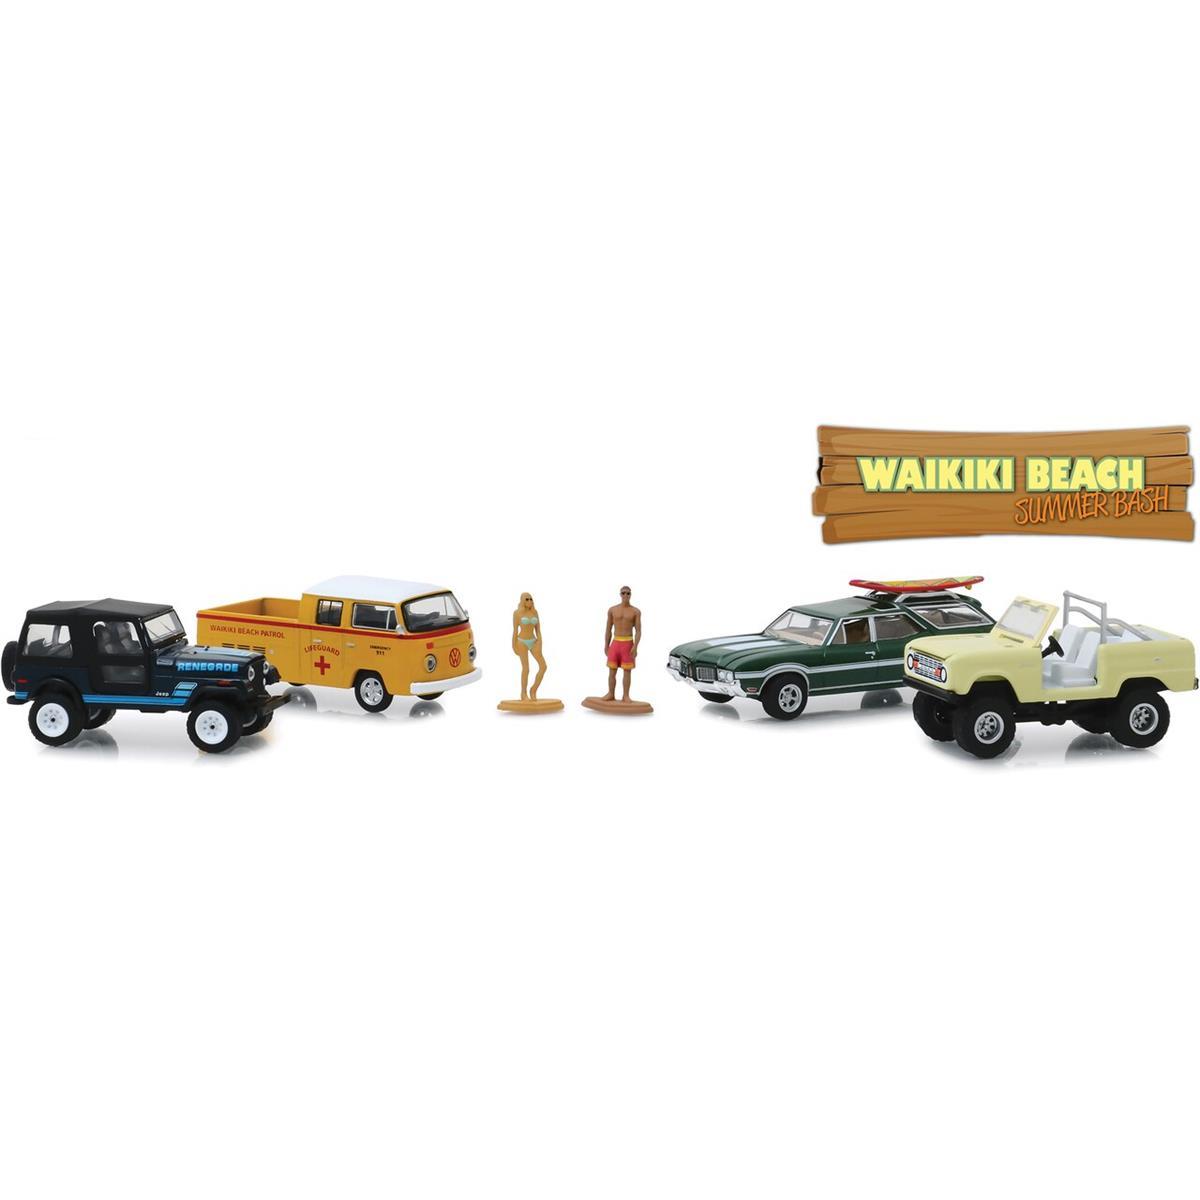 Greenlight Waikiki Beach Multi-Car Diorama 1/64 Scale スケール Diecast Model ダイキャスト ミニカー おもちゃ 玩具 コレクション ミニチュア ダイカスト クリスマス プレゼント ・...